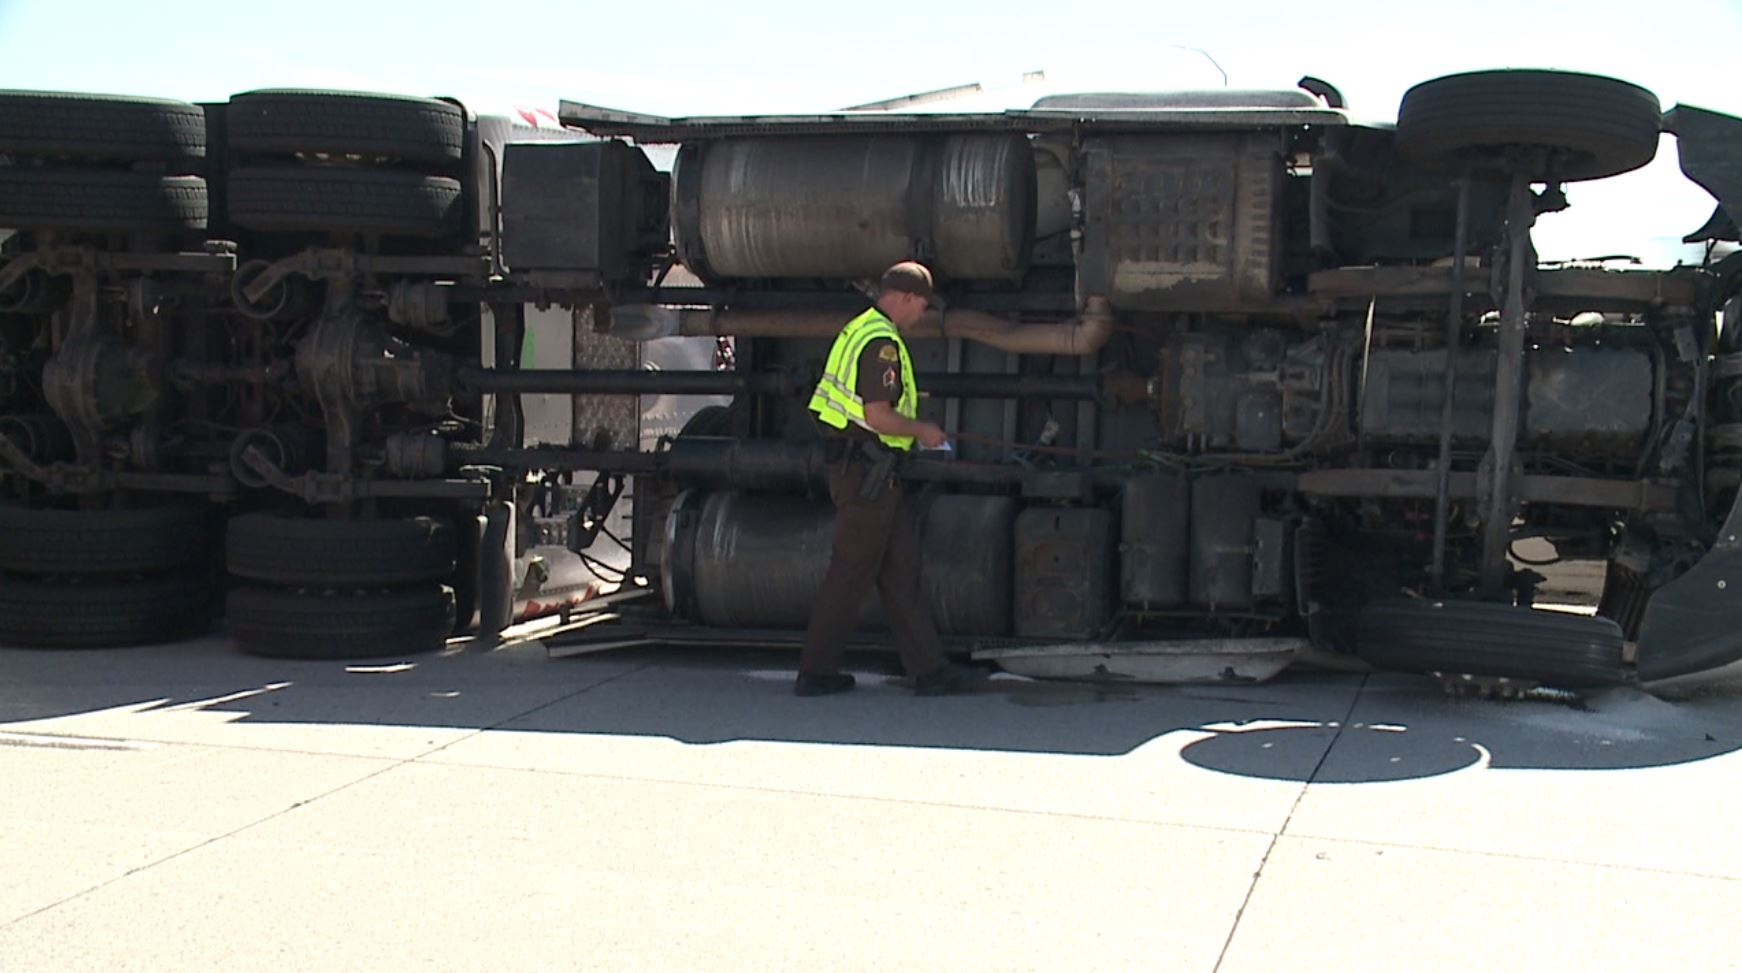 Photos: Truck tips over on sharp curve enteringI-80